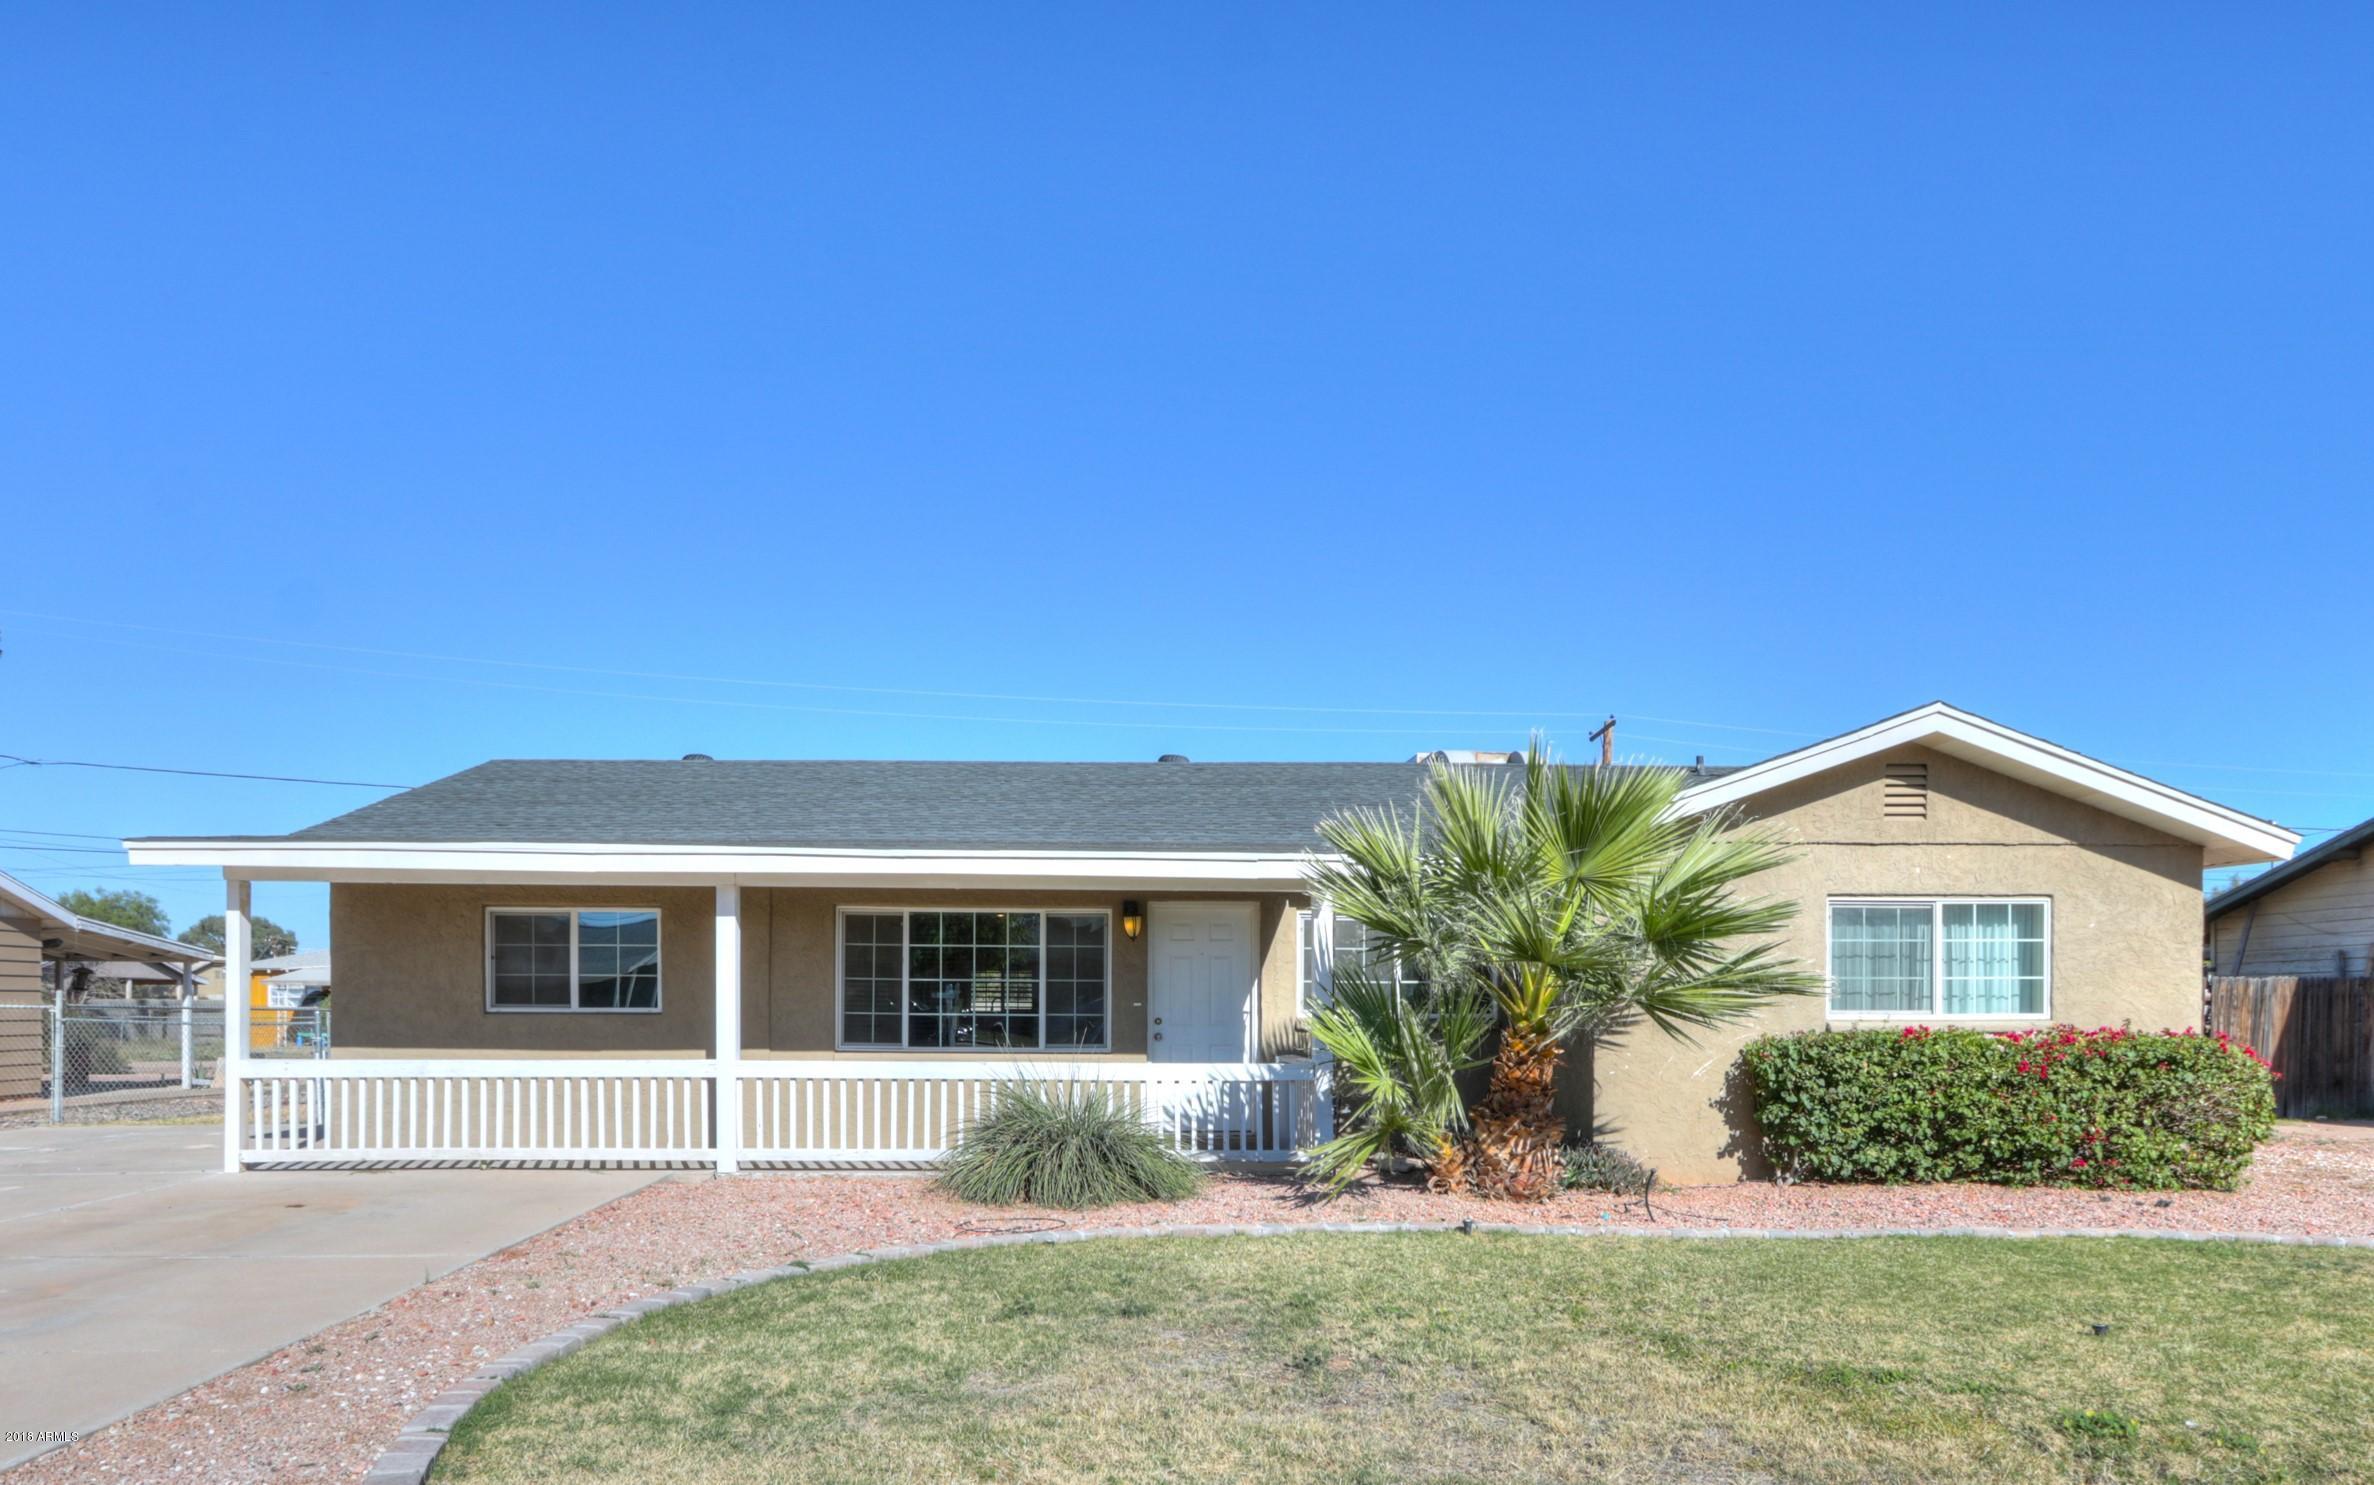 Photo for 1120 E 12th Street, Casa Grande, AZ 85122 (MLS # 5851416)